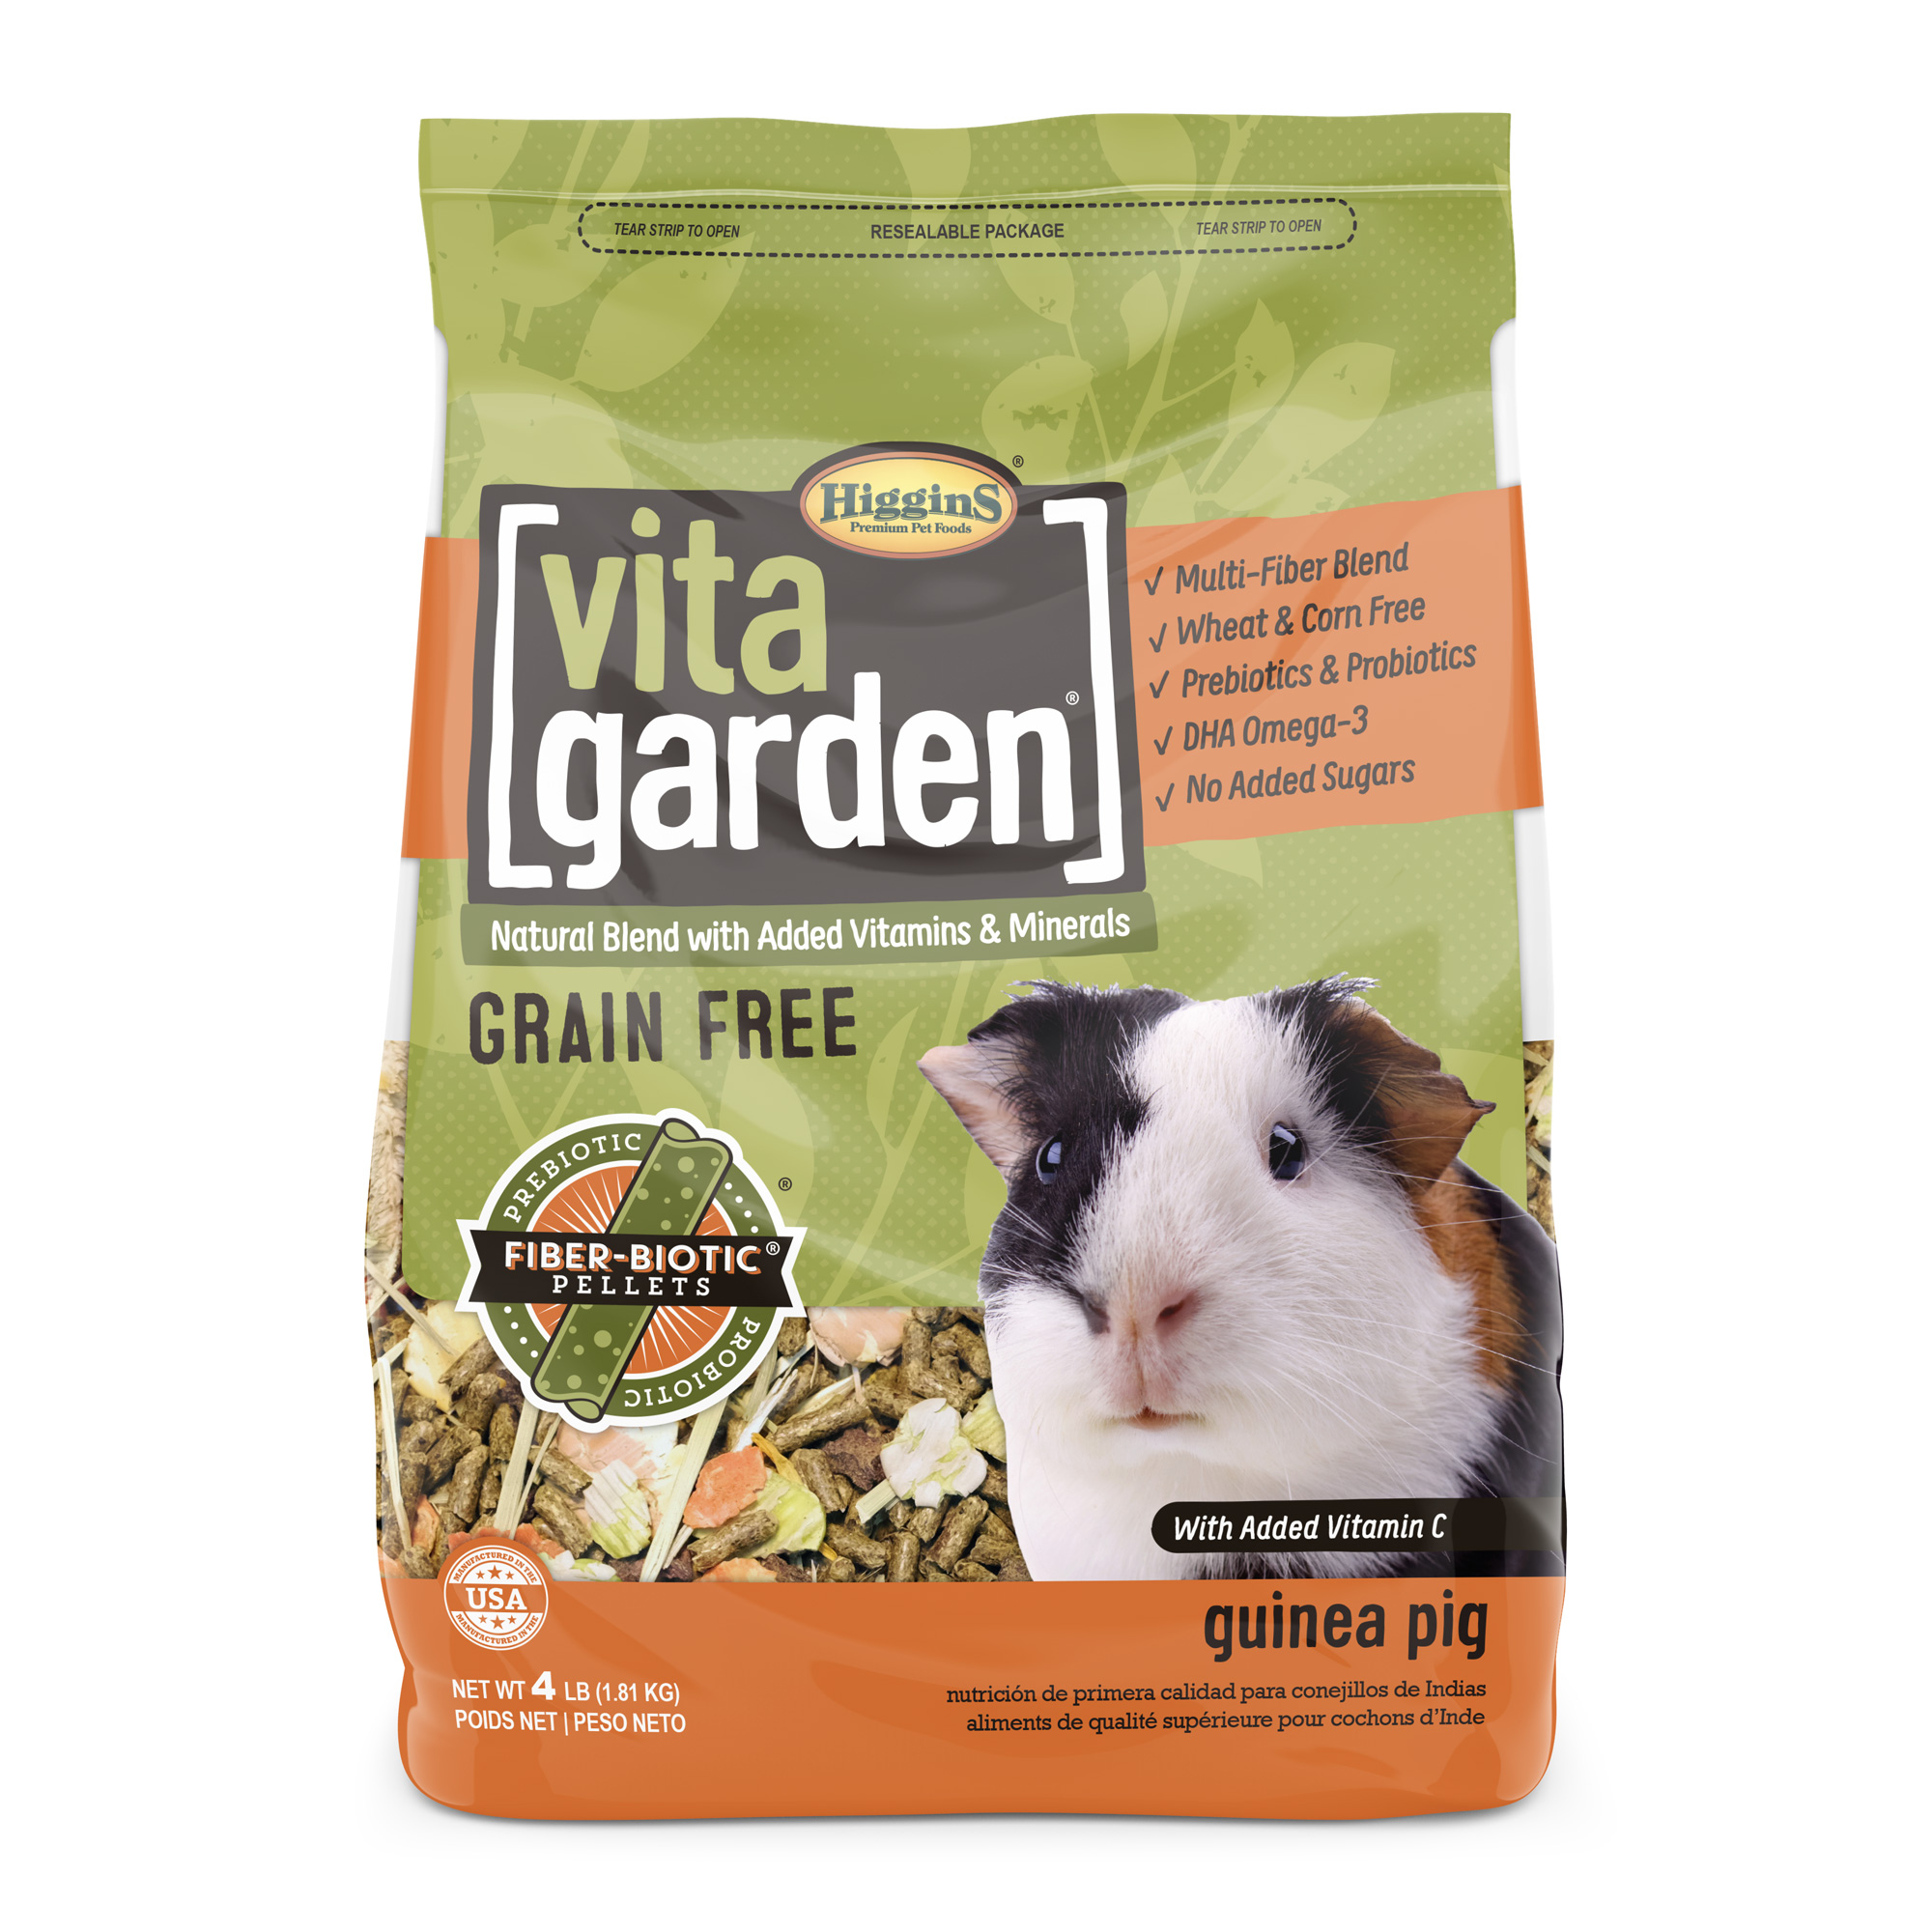 55670_Vita Garden_Guinea Pig_4 lb.jpg